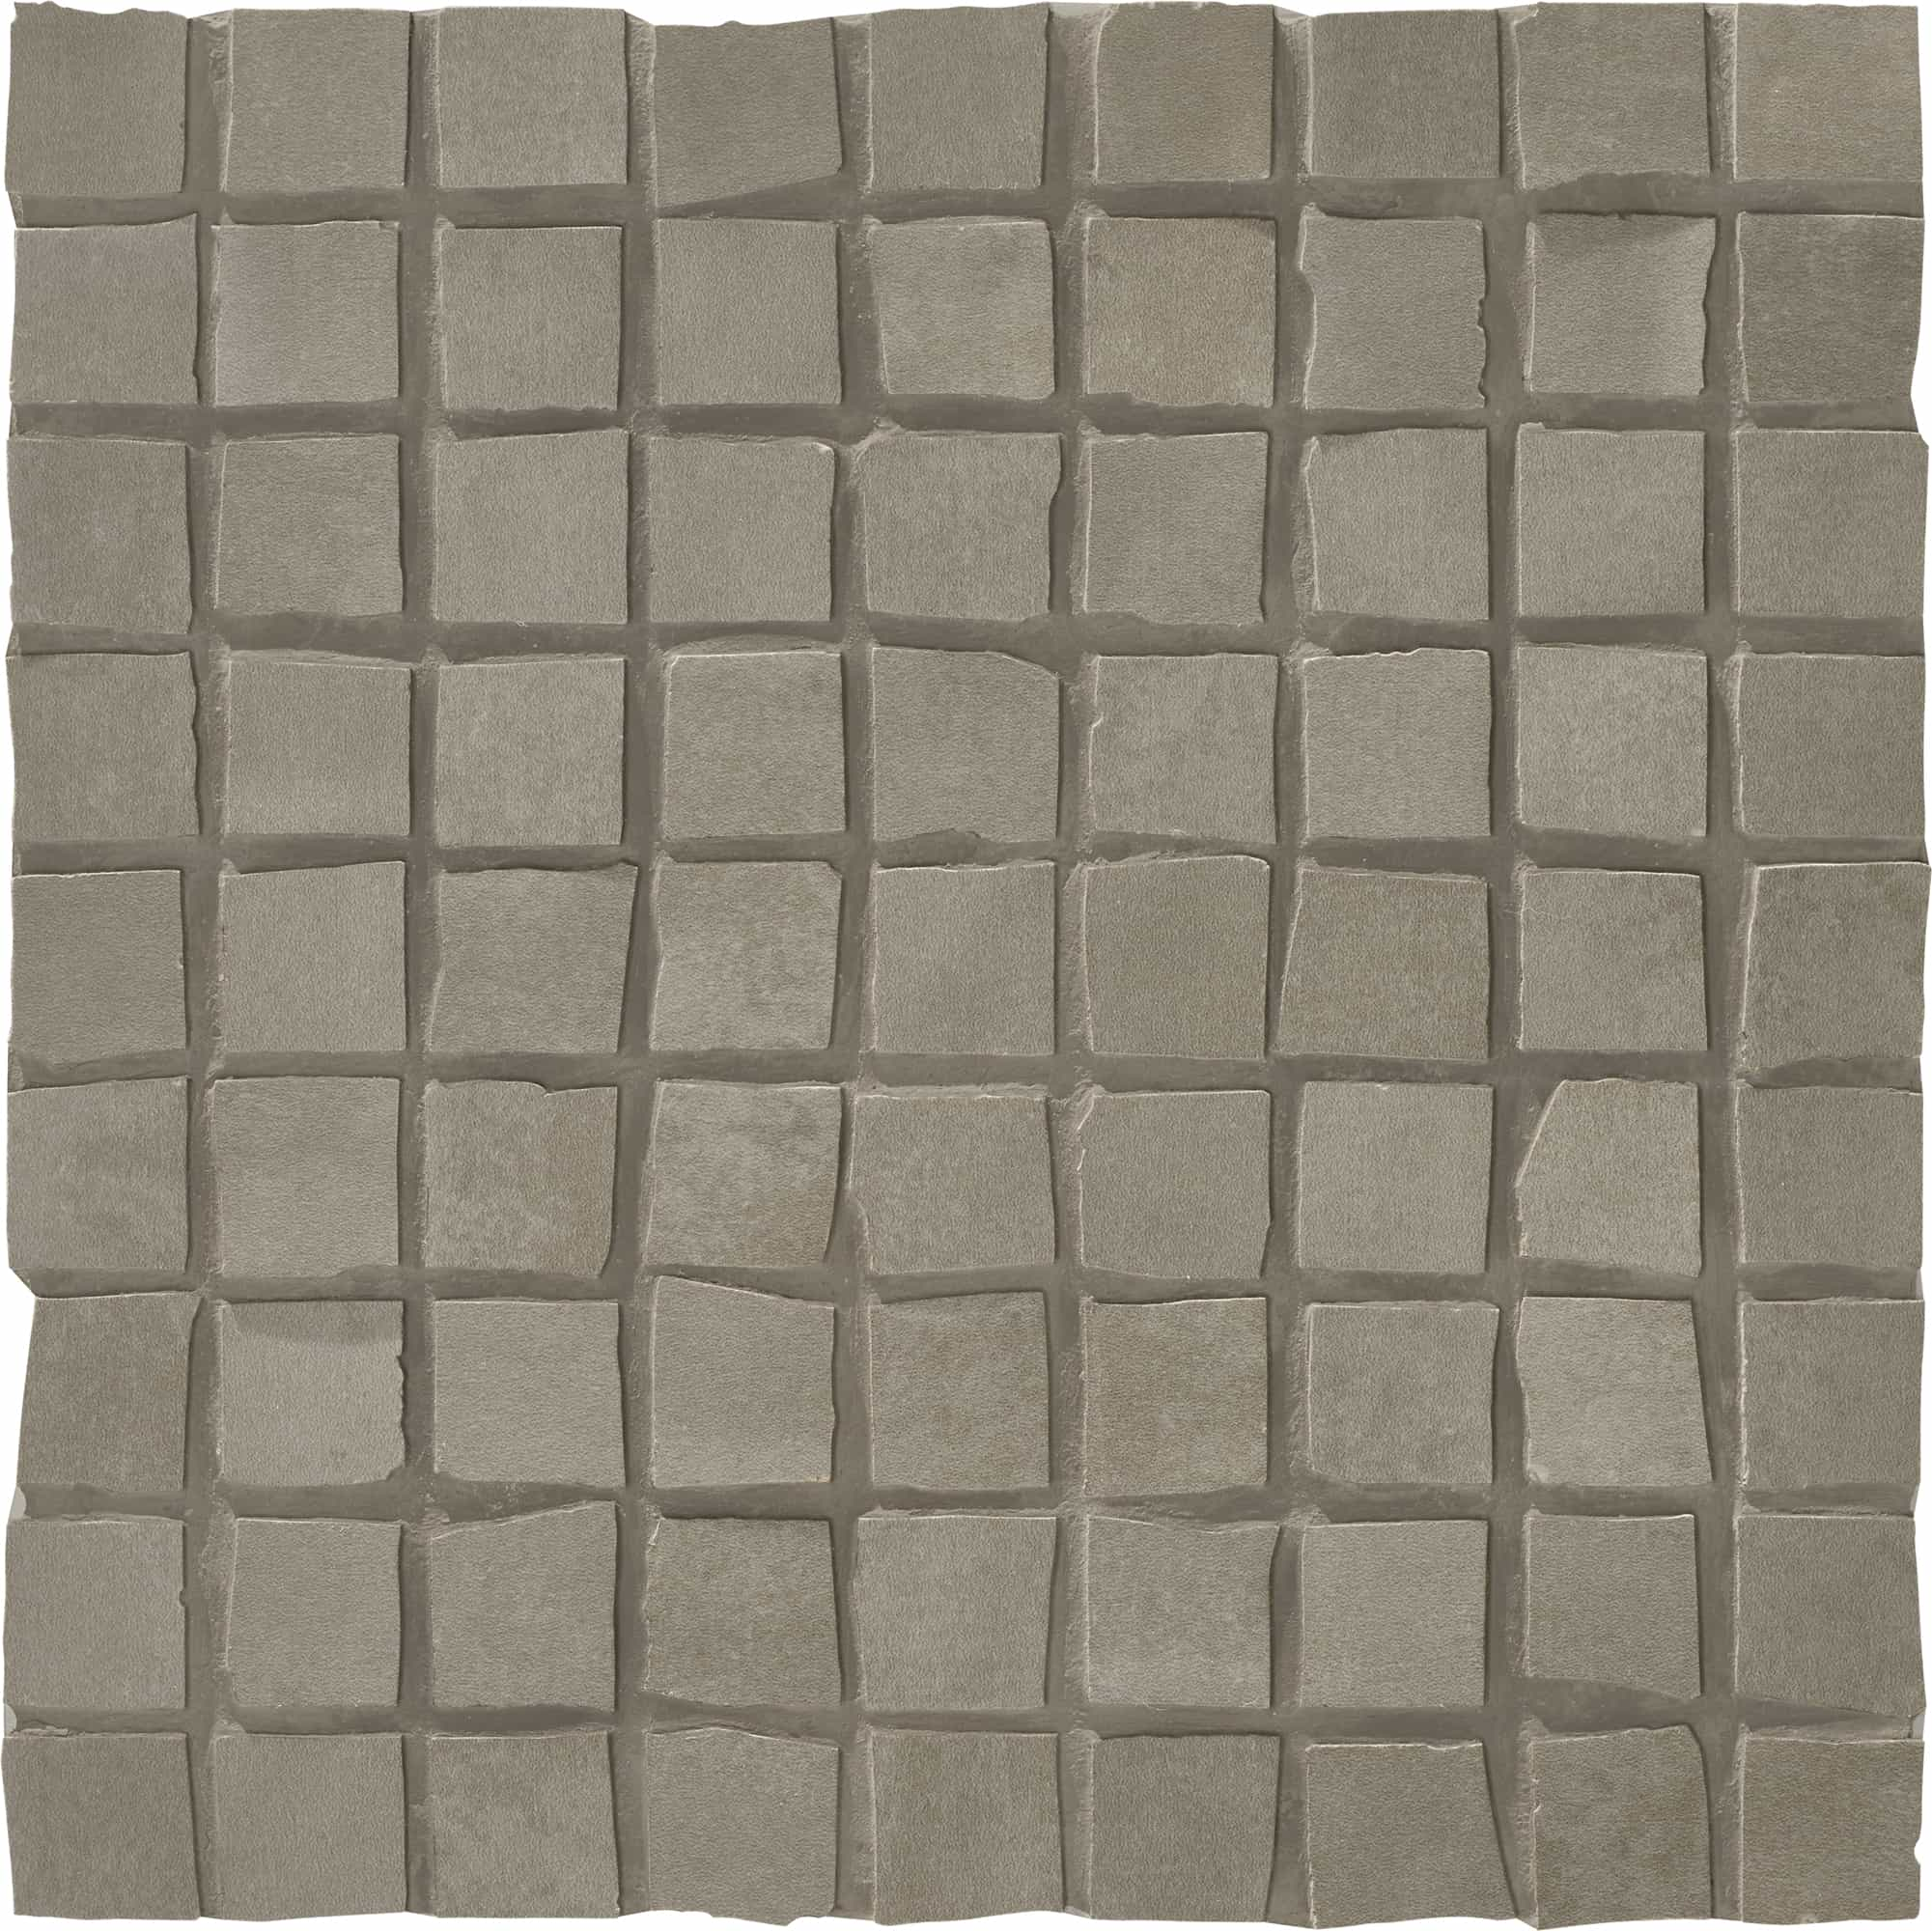 Mosaic Ground Grey